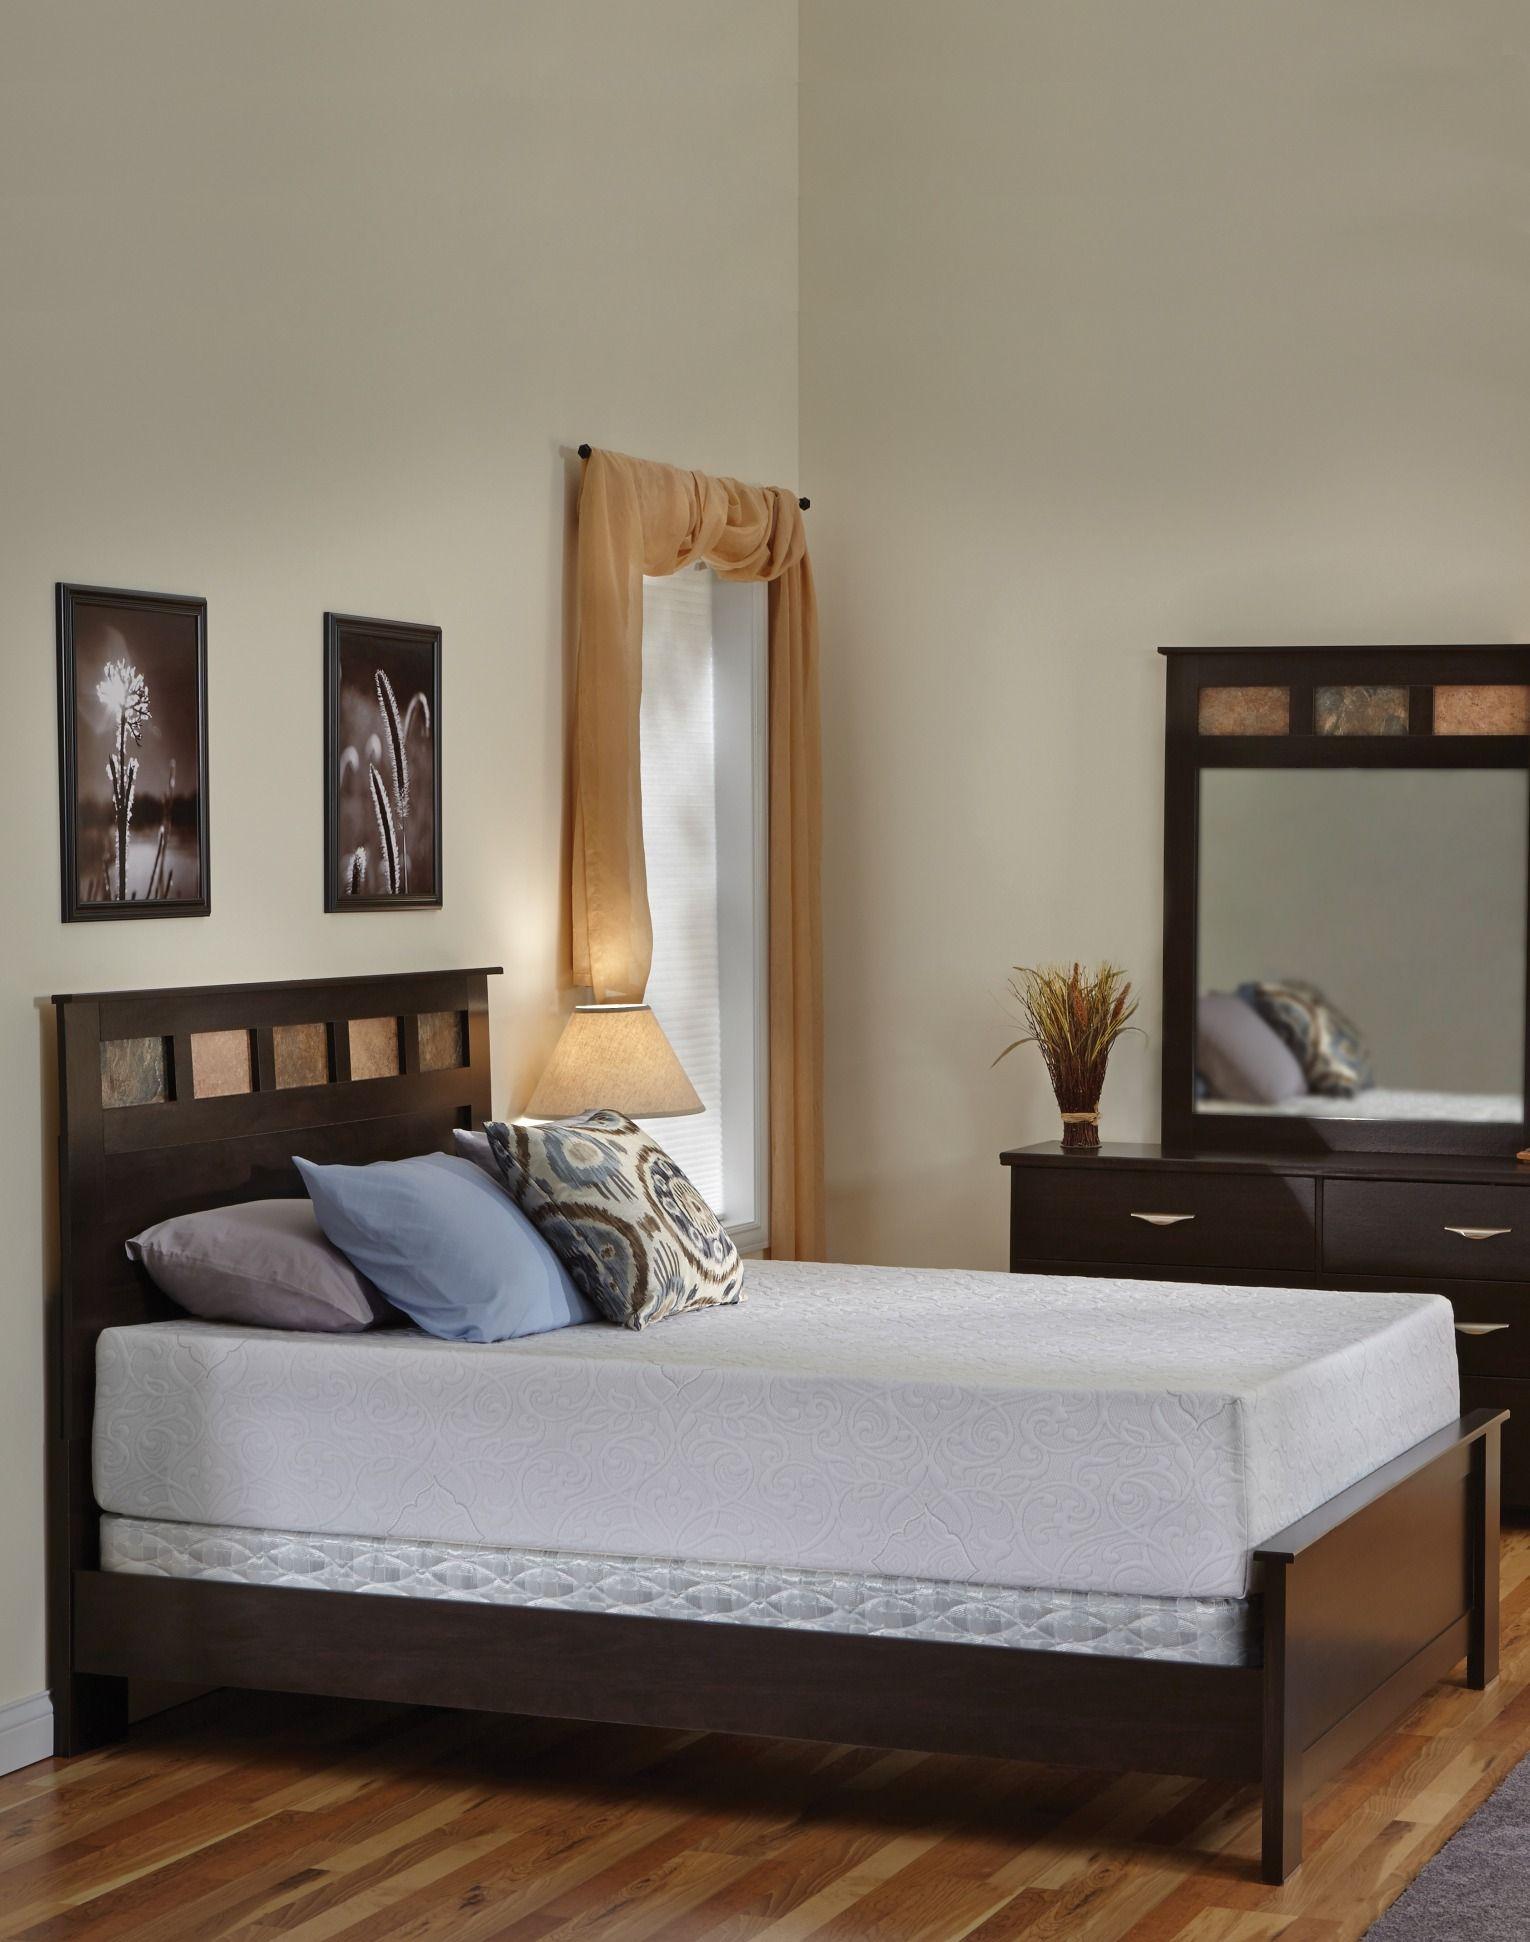 Get a goodnightus sleep with the serta perfect sleeper marshbrook